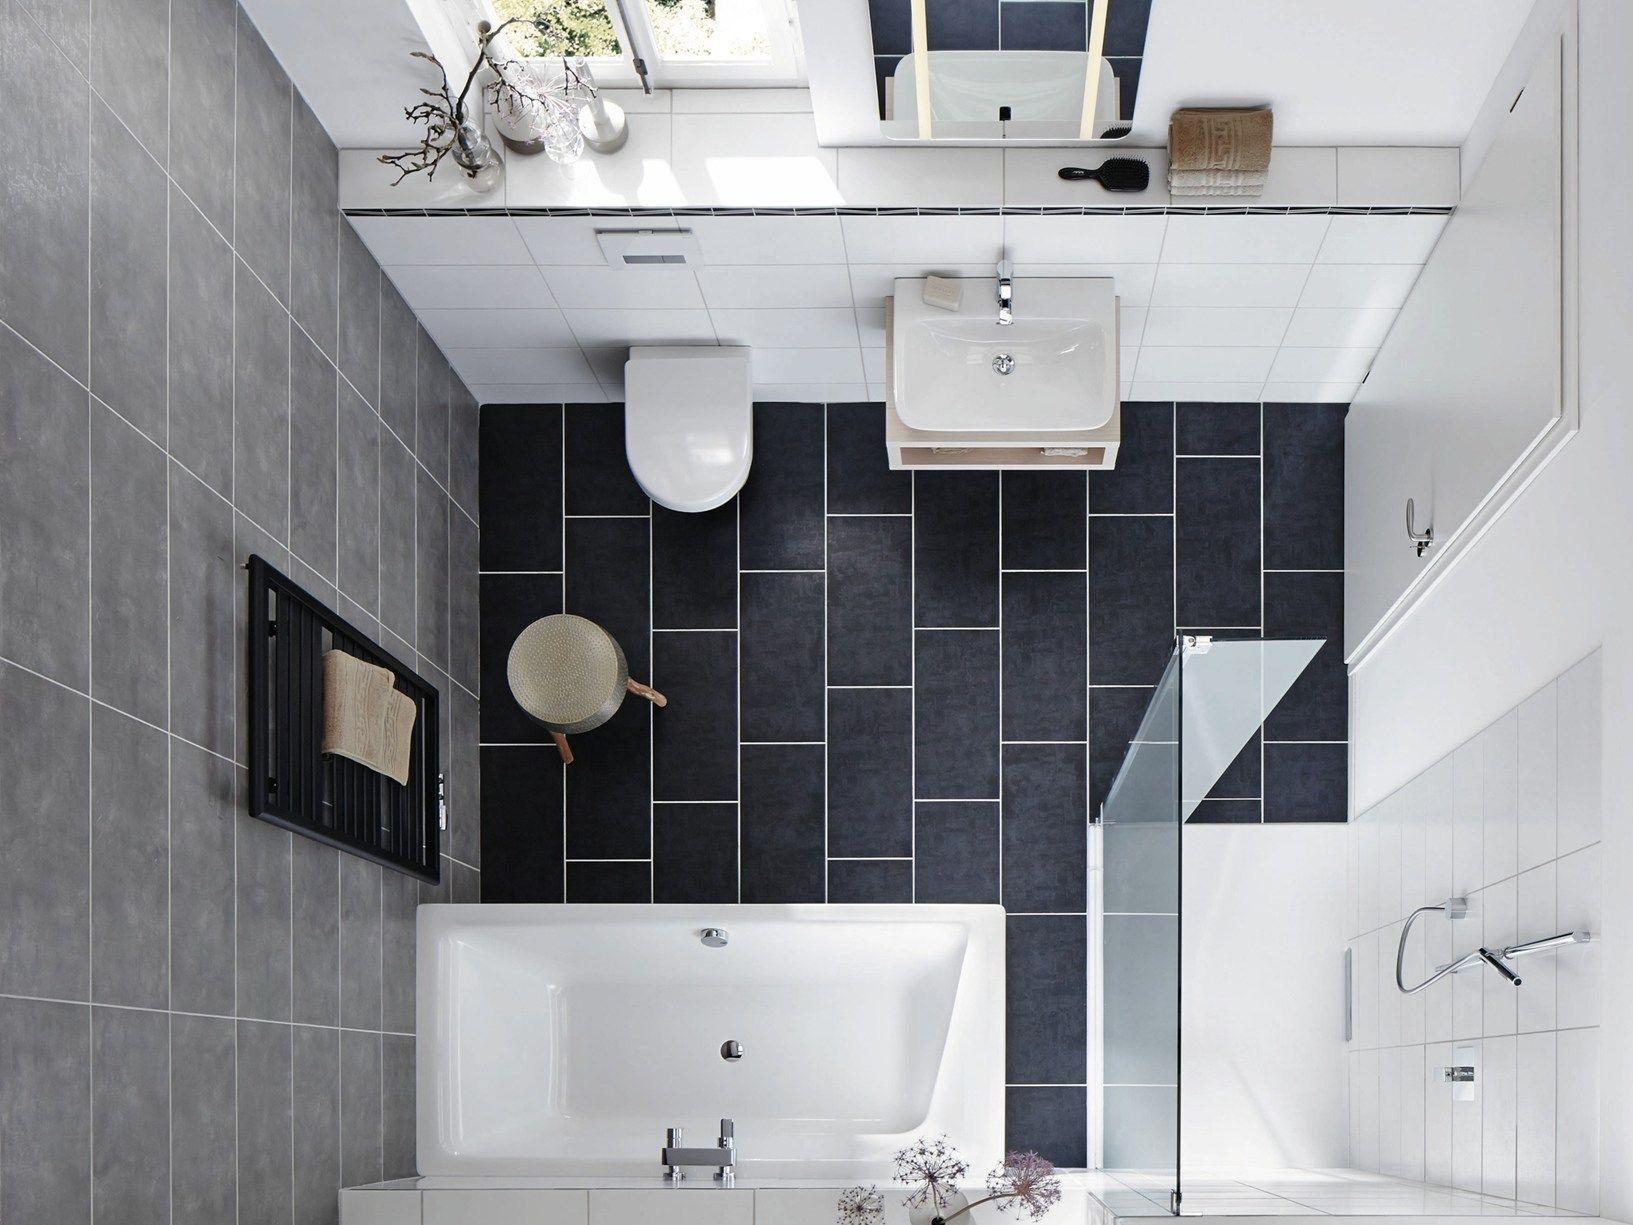 Vasca Da Bagno Incasso Pavimento : Vasche da bagno e piatti doccia a filo pavimento kaldewei